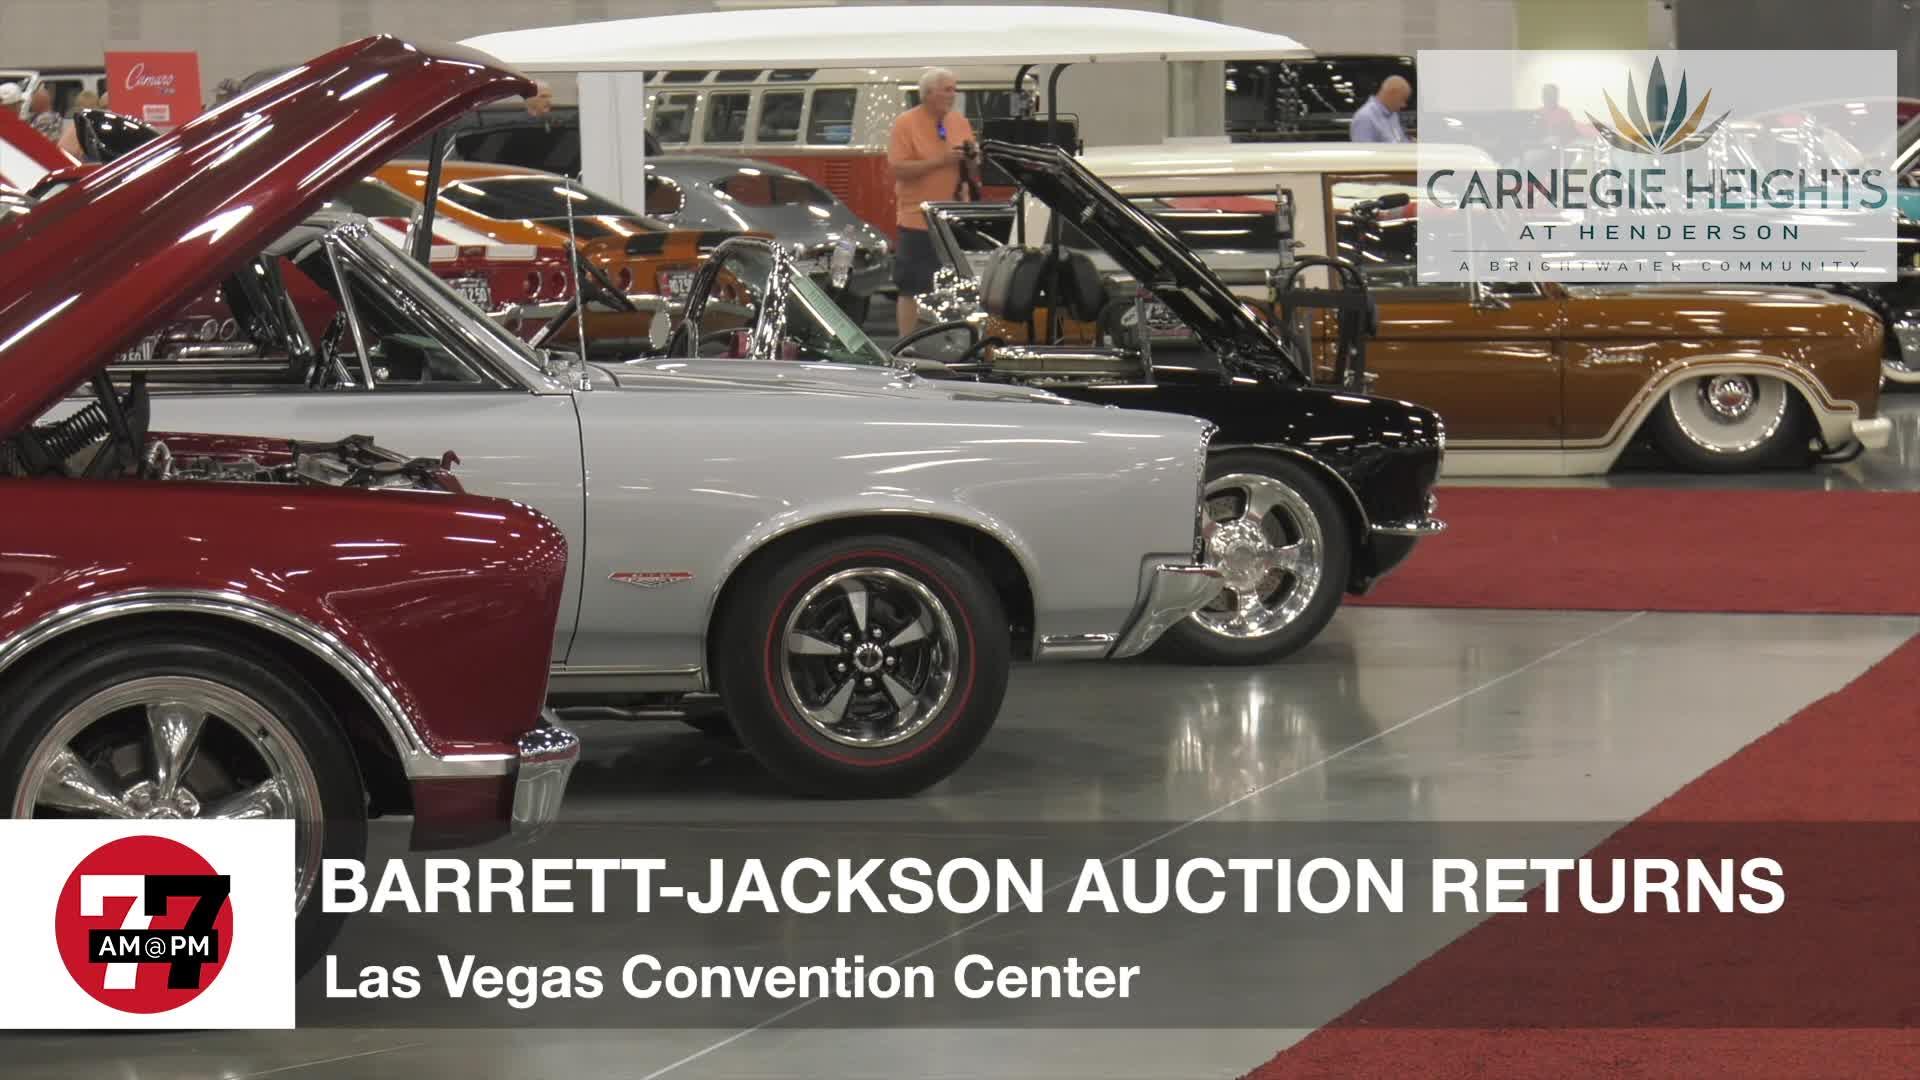 7@7PM Barrett-Jackson Auction Returns